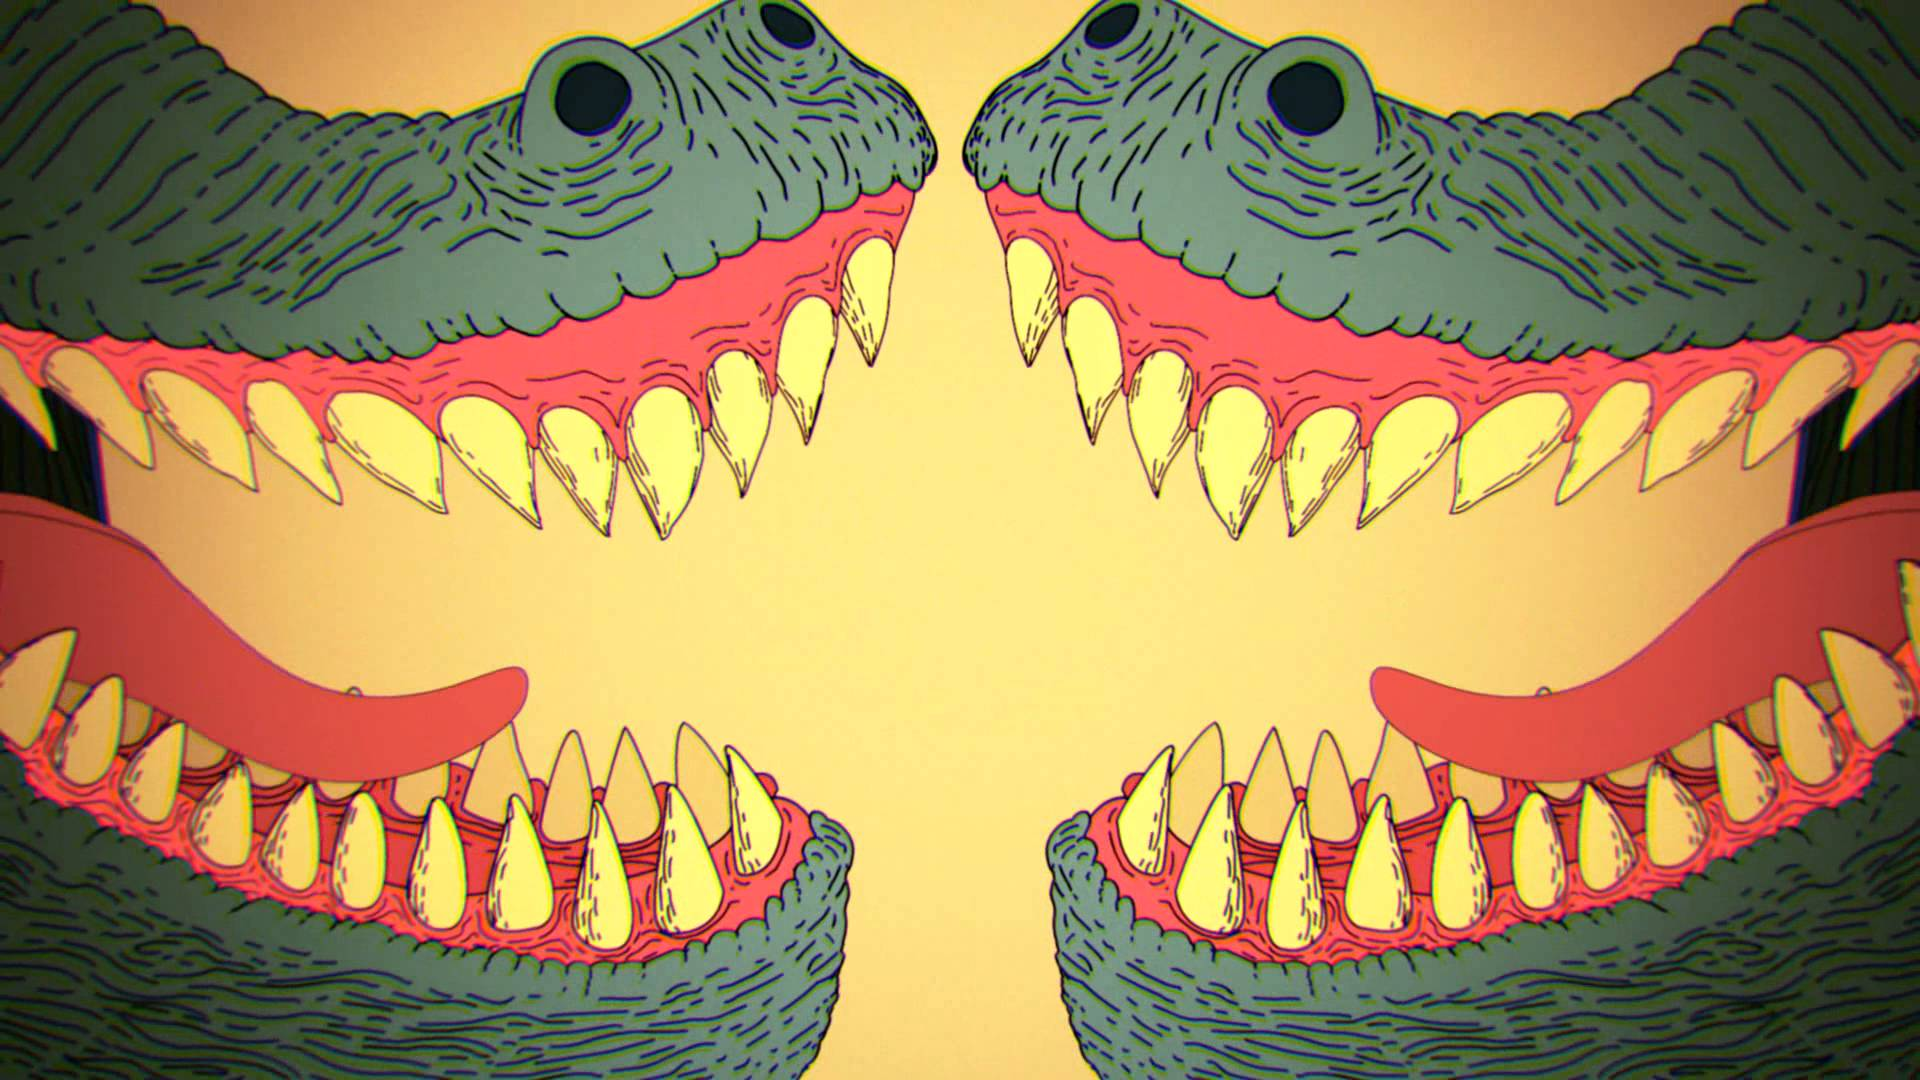 Drawn triipy dinosaur 16bit  1080p YouTube (Official